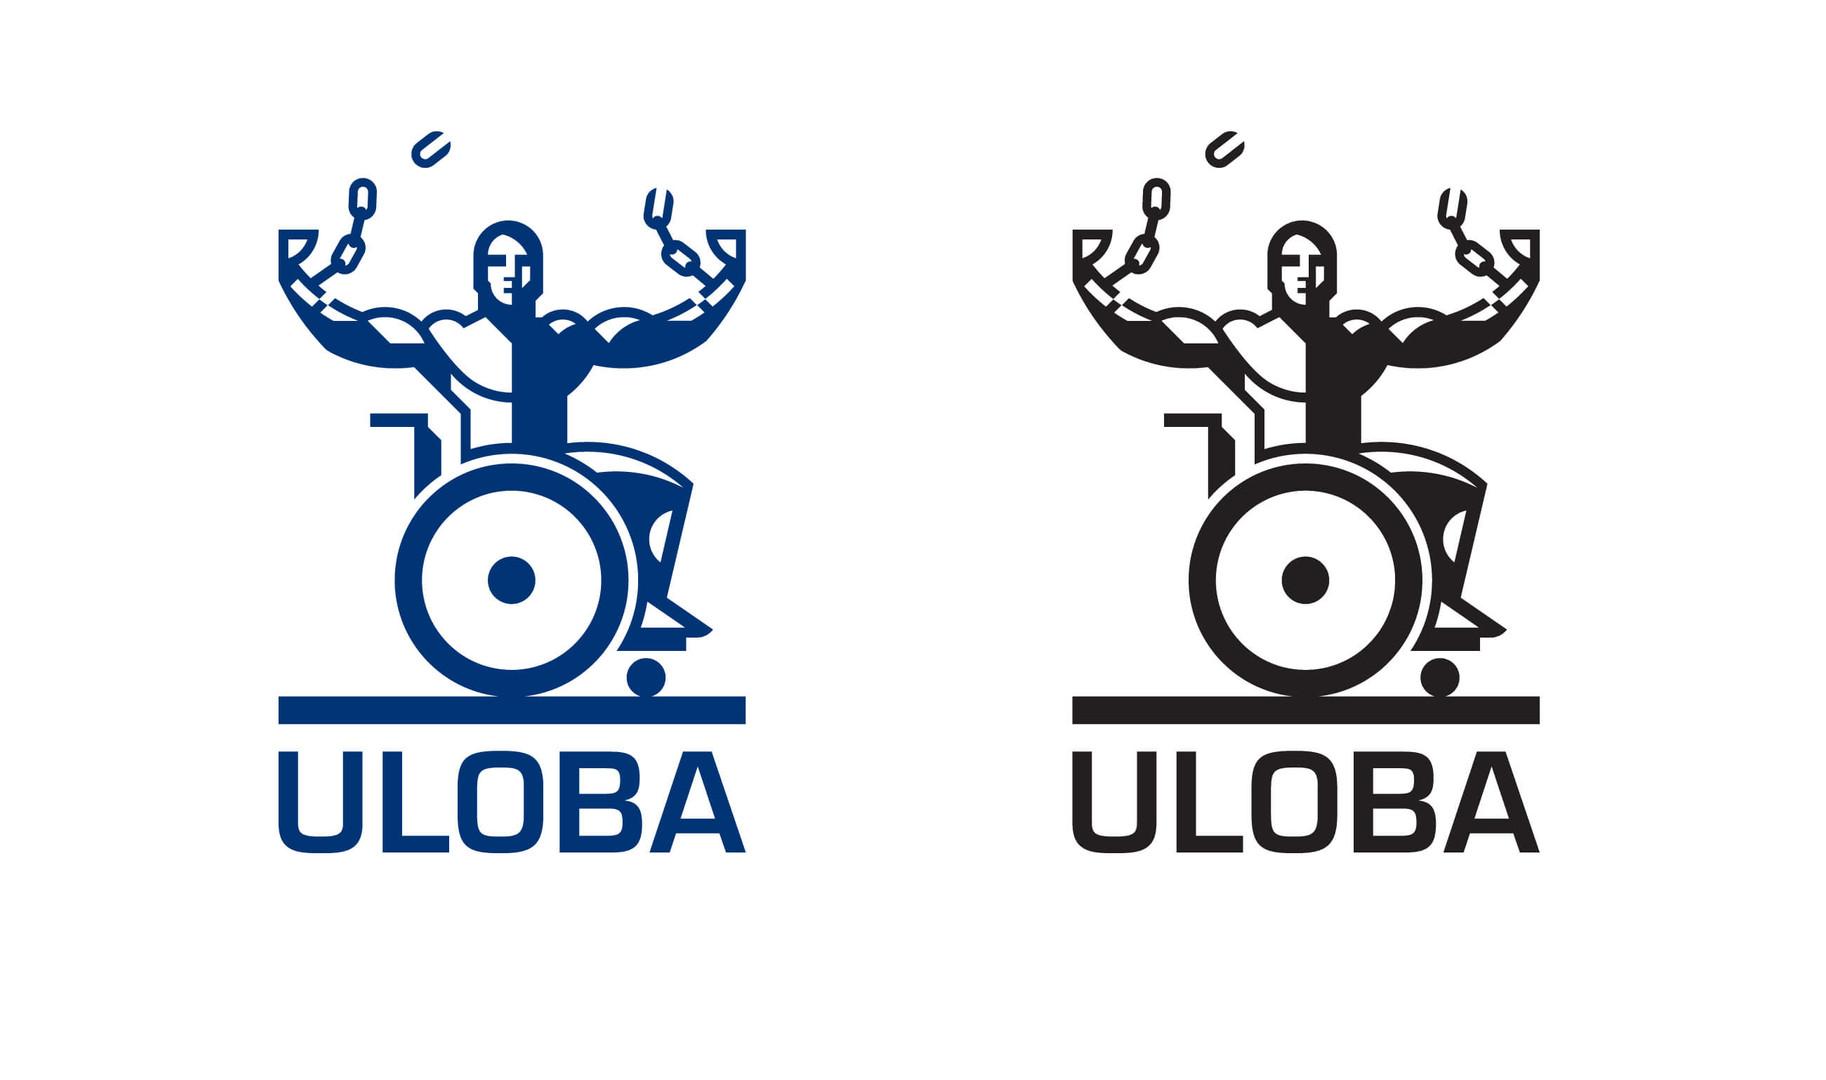 Uloba_logo1.jpg